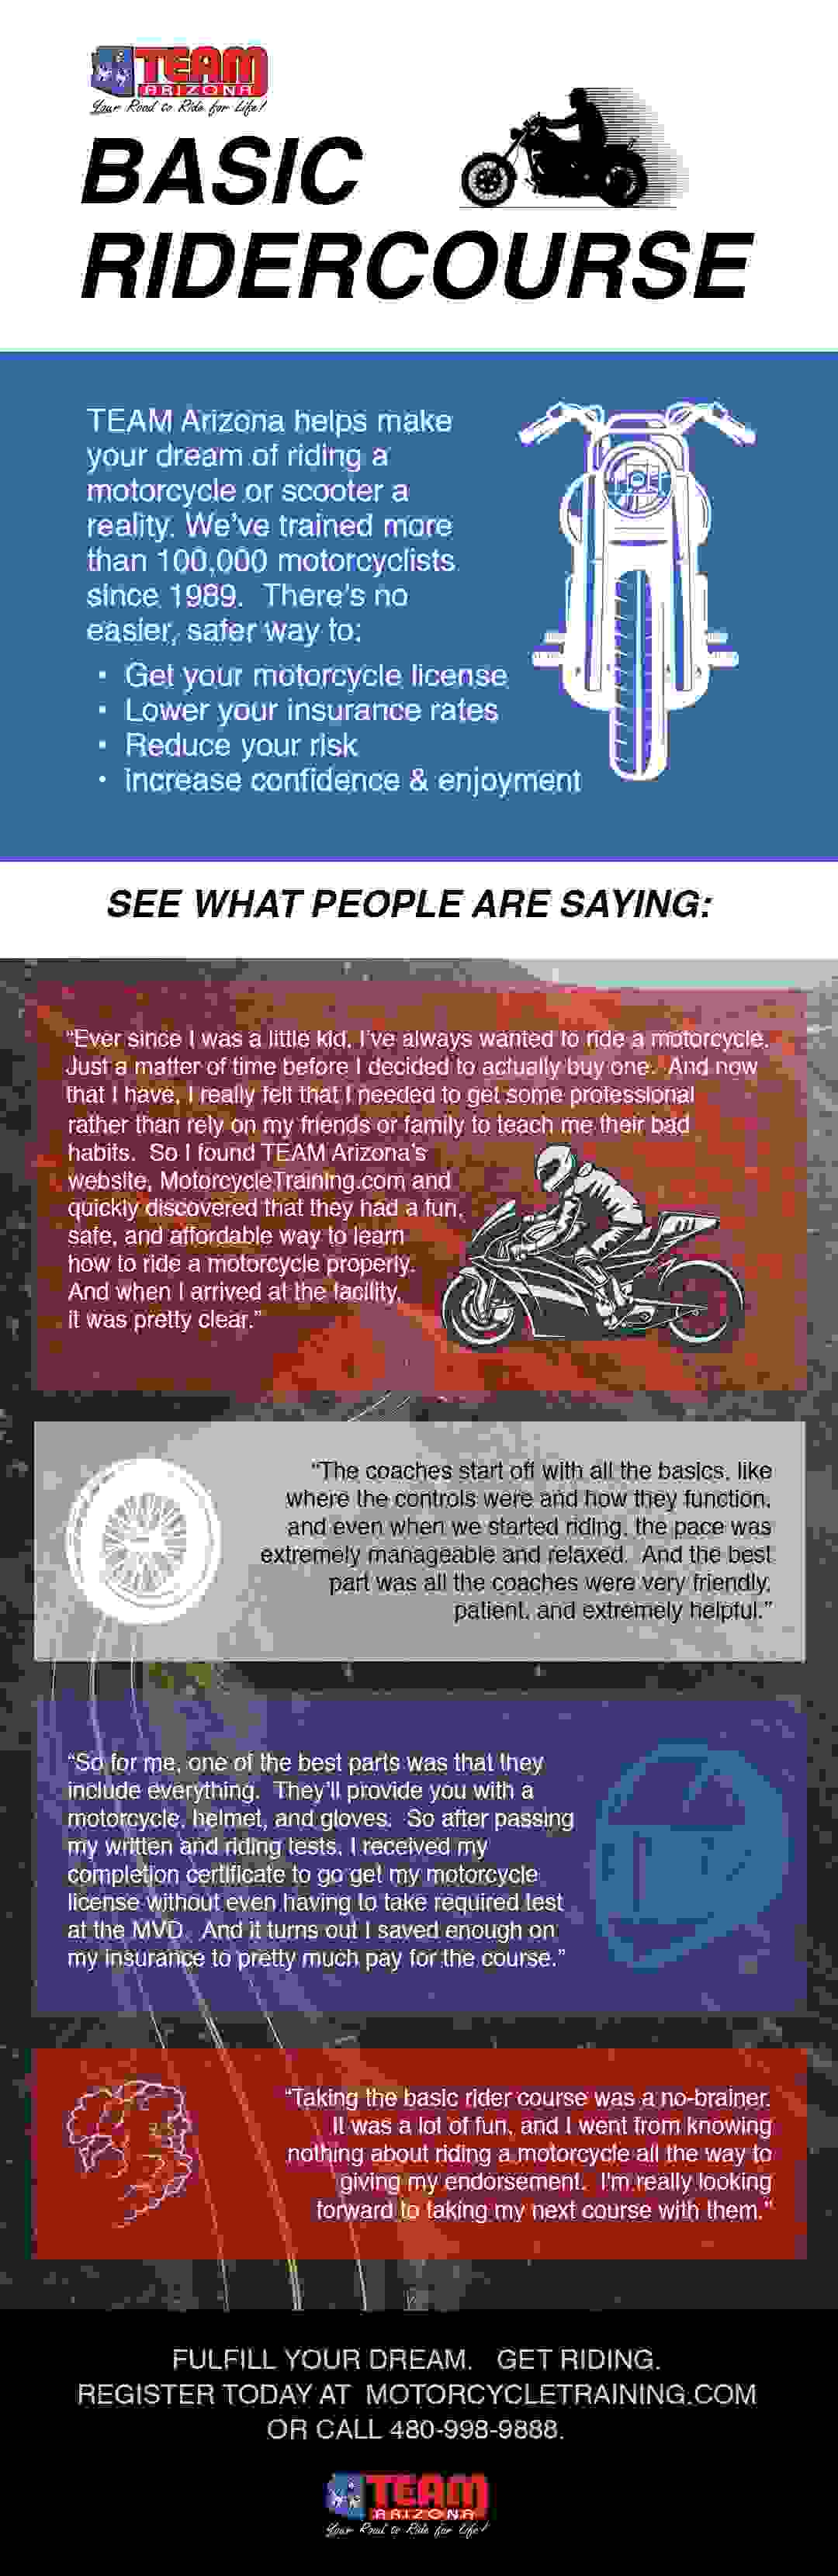 Basic Motorcycle Rider Course Team Arizona